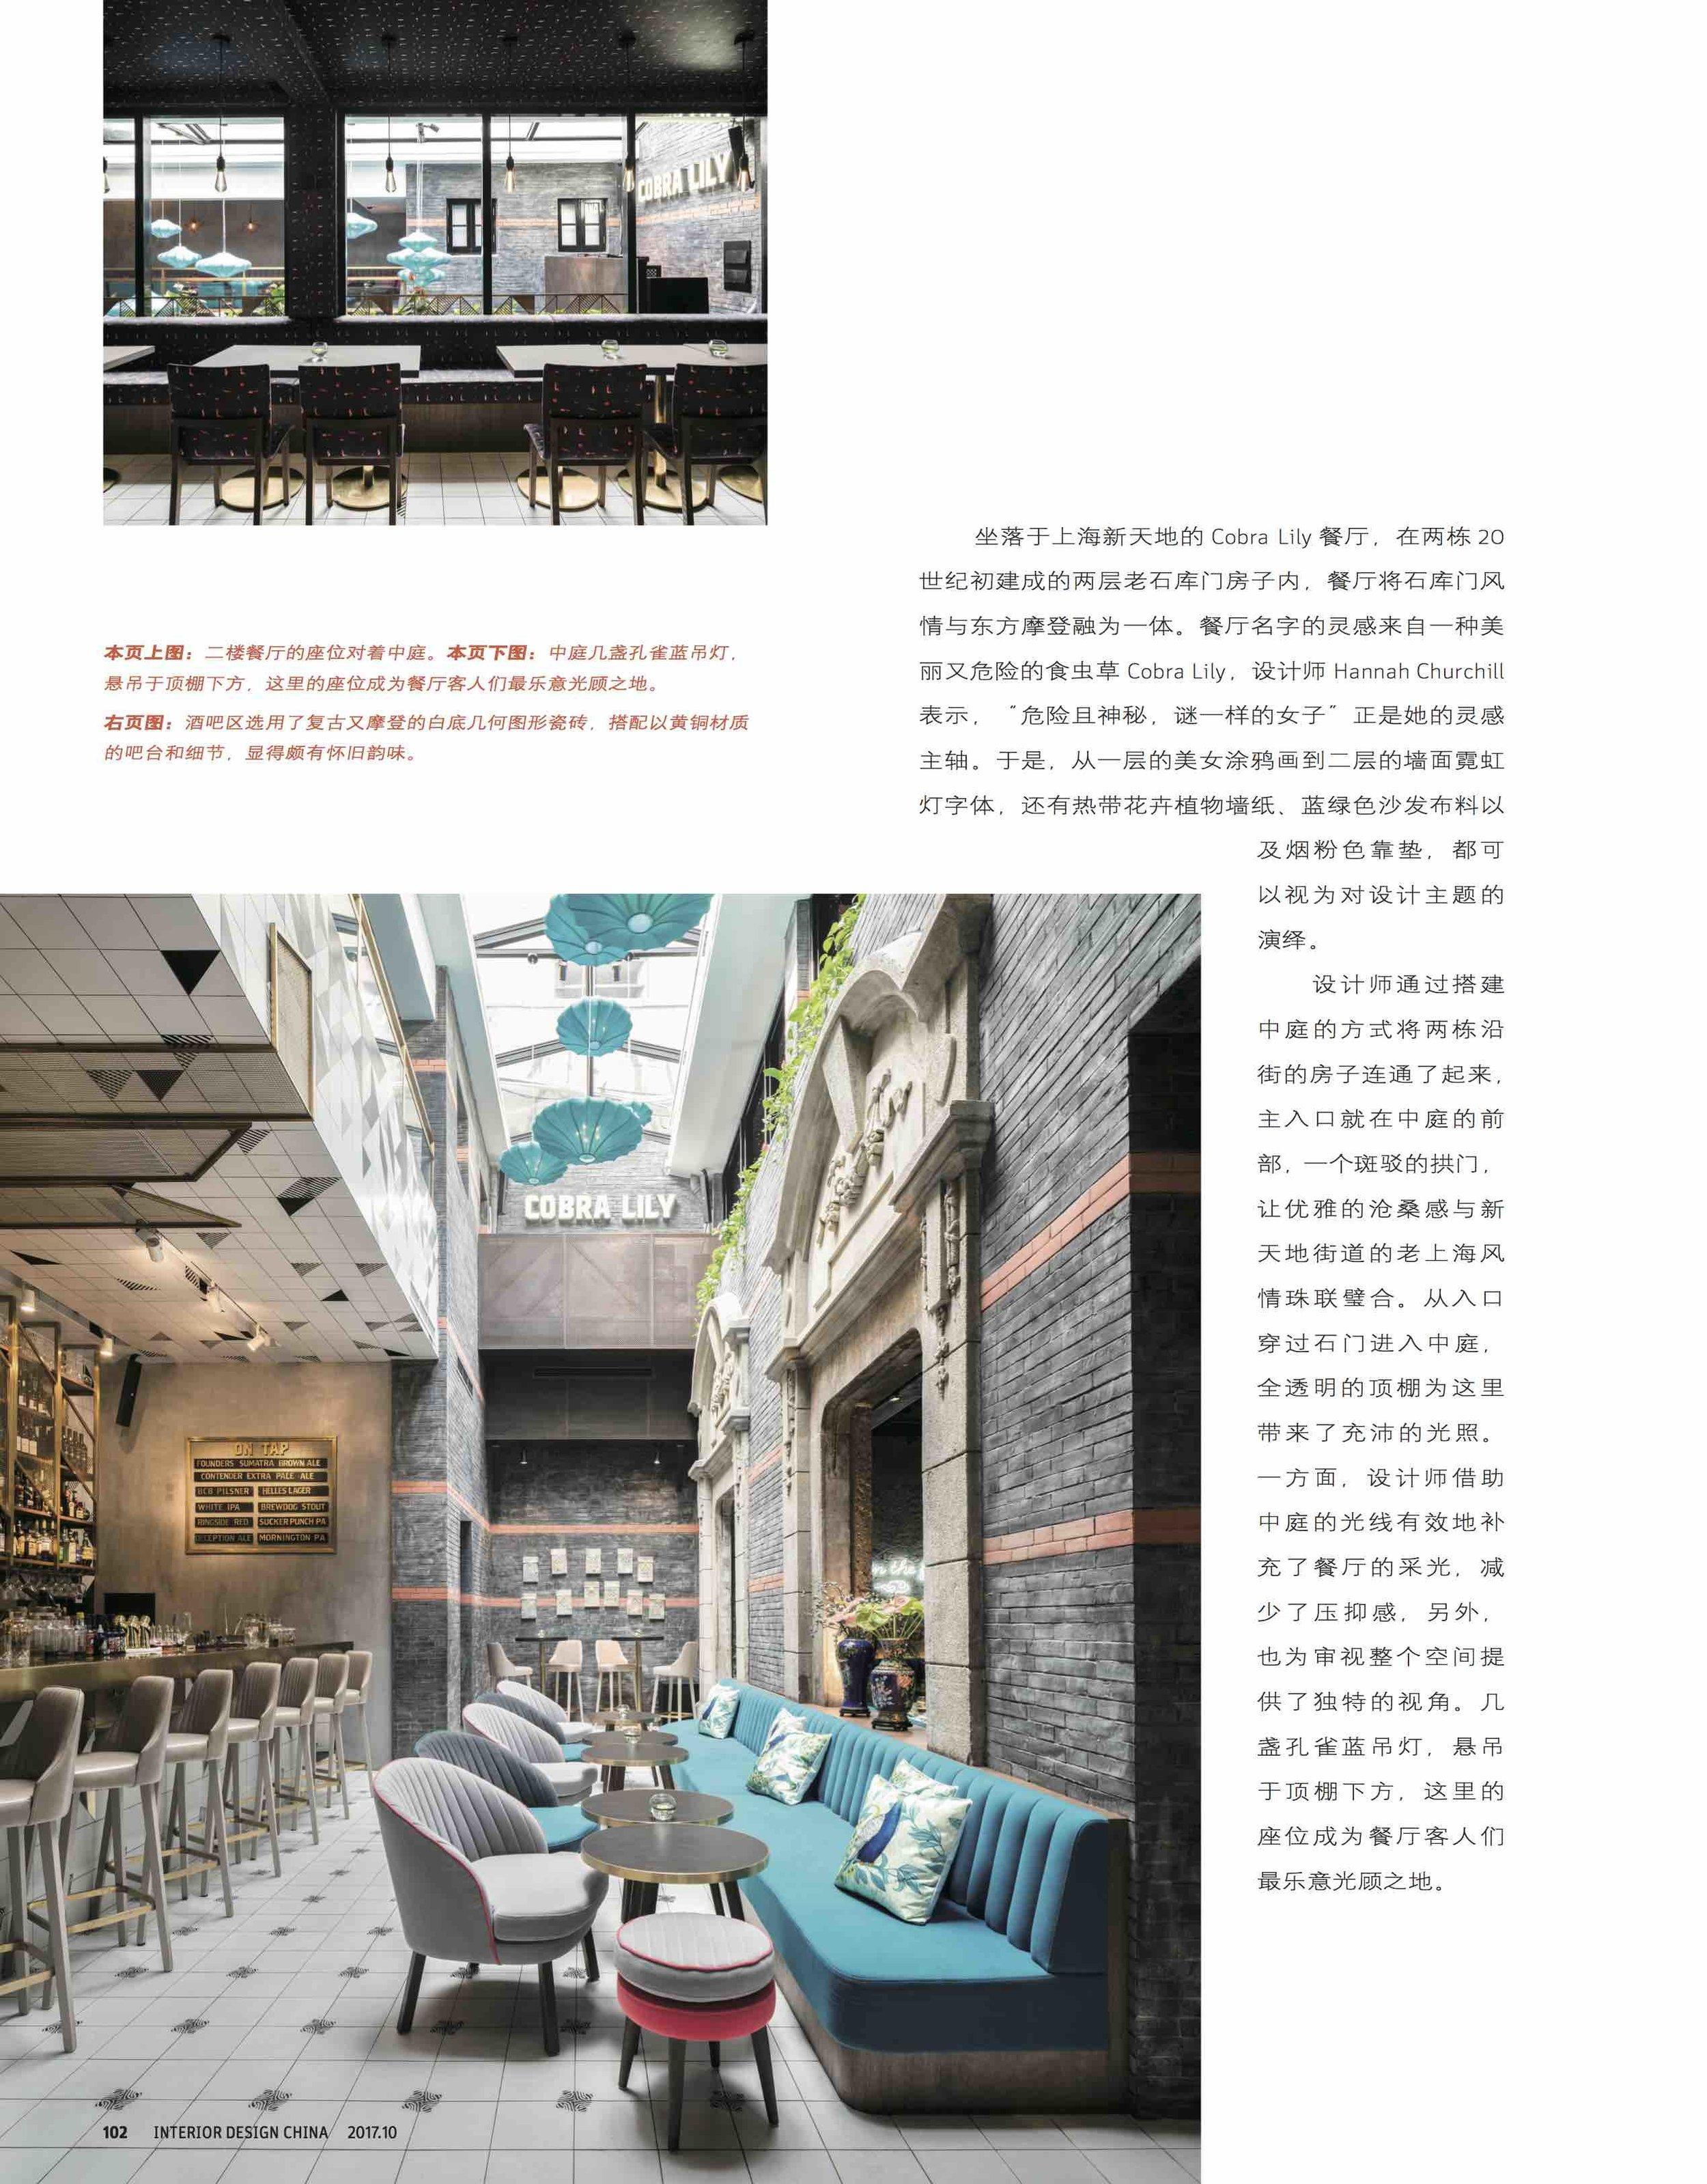 Interior Design China Oct 2017_Cobra Lily_3.jpg